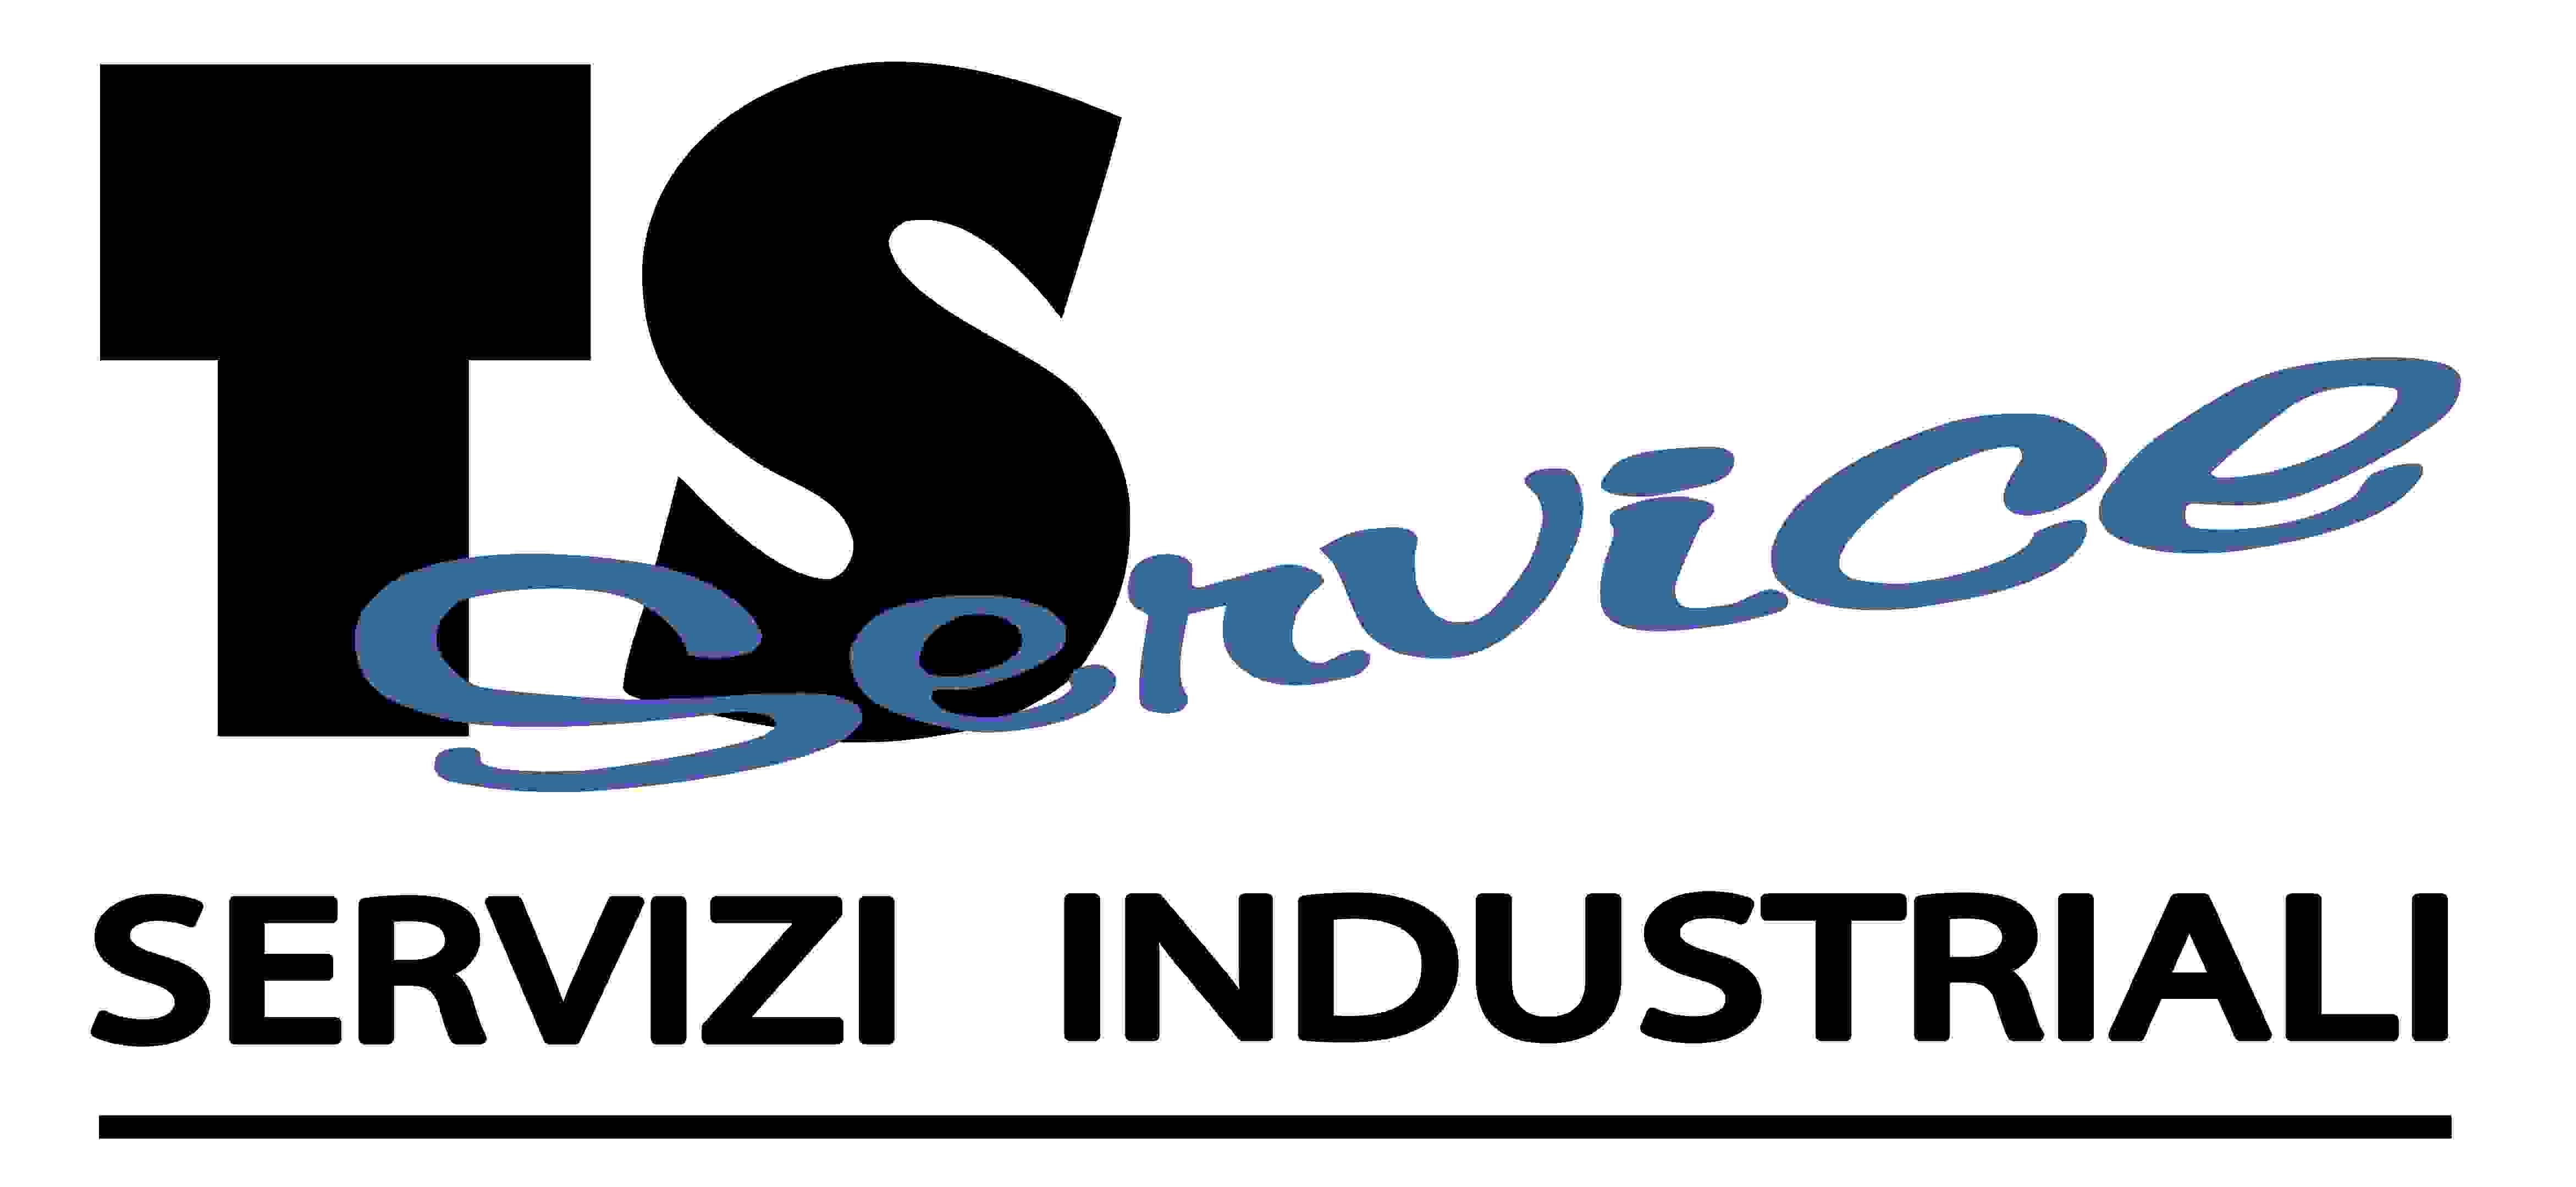 logo-ts-service-corto